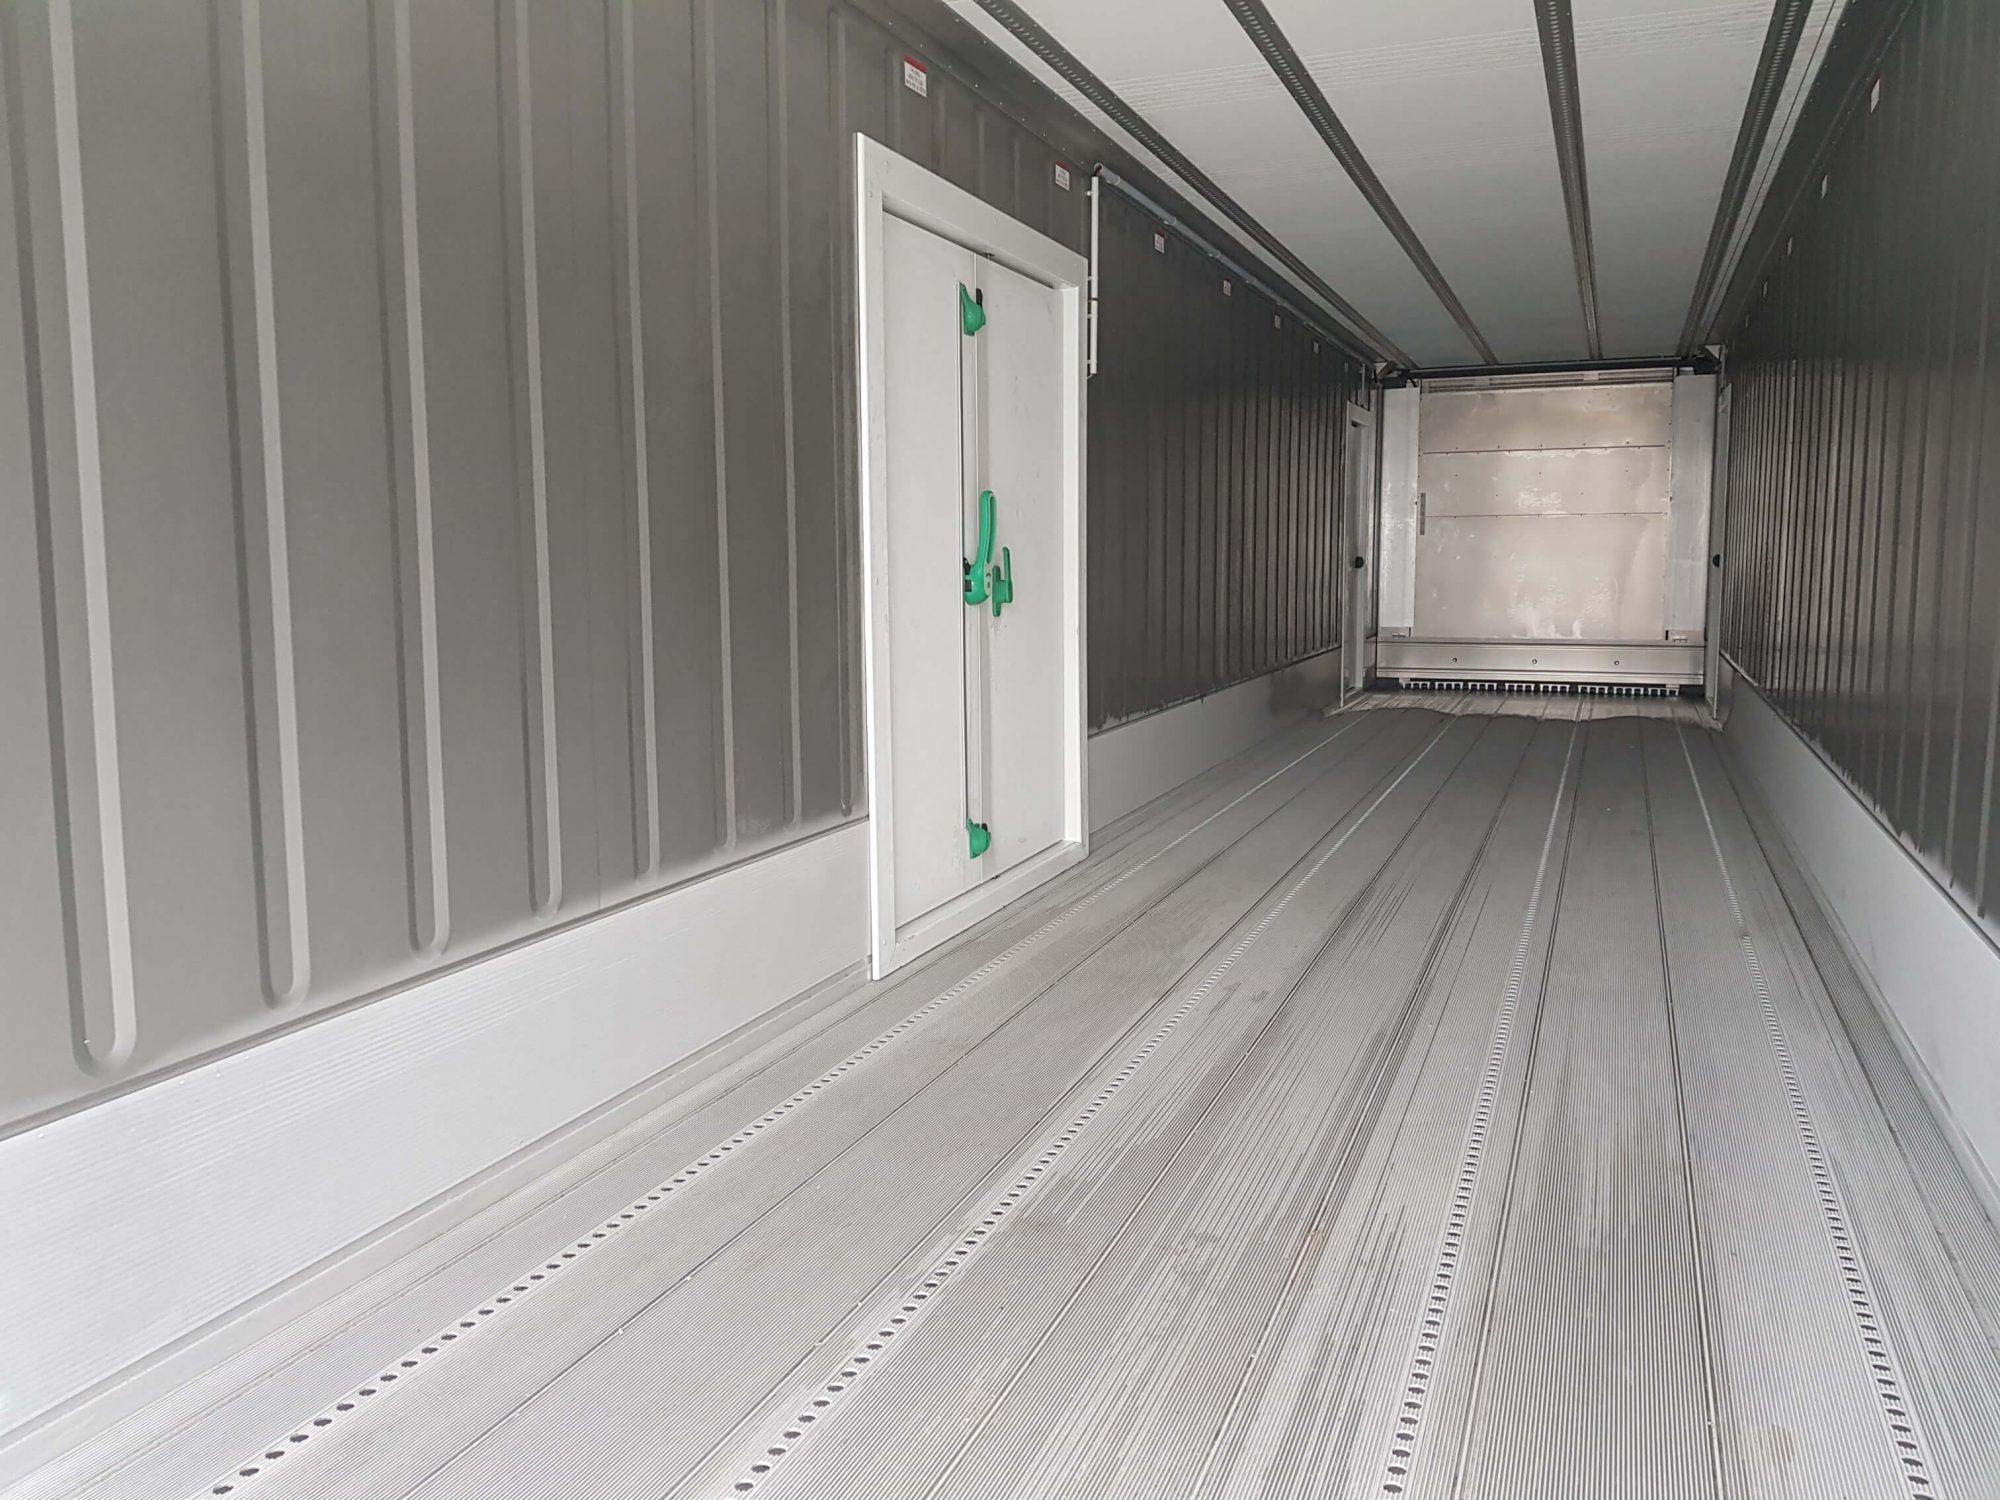 porte-conteneur-frigorifique